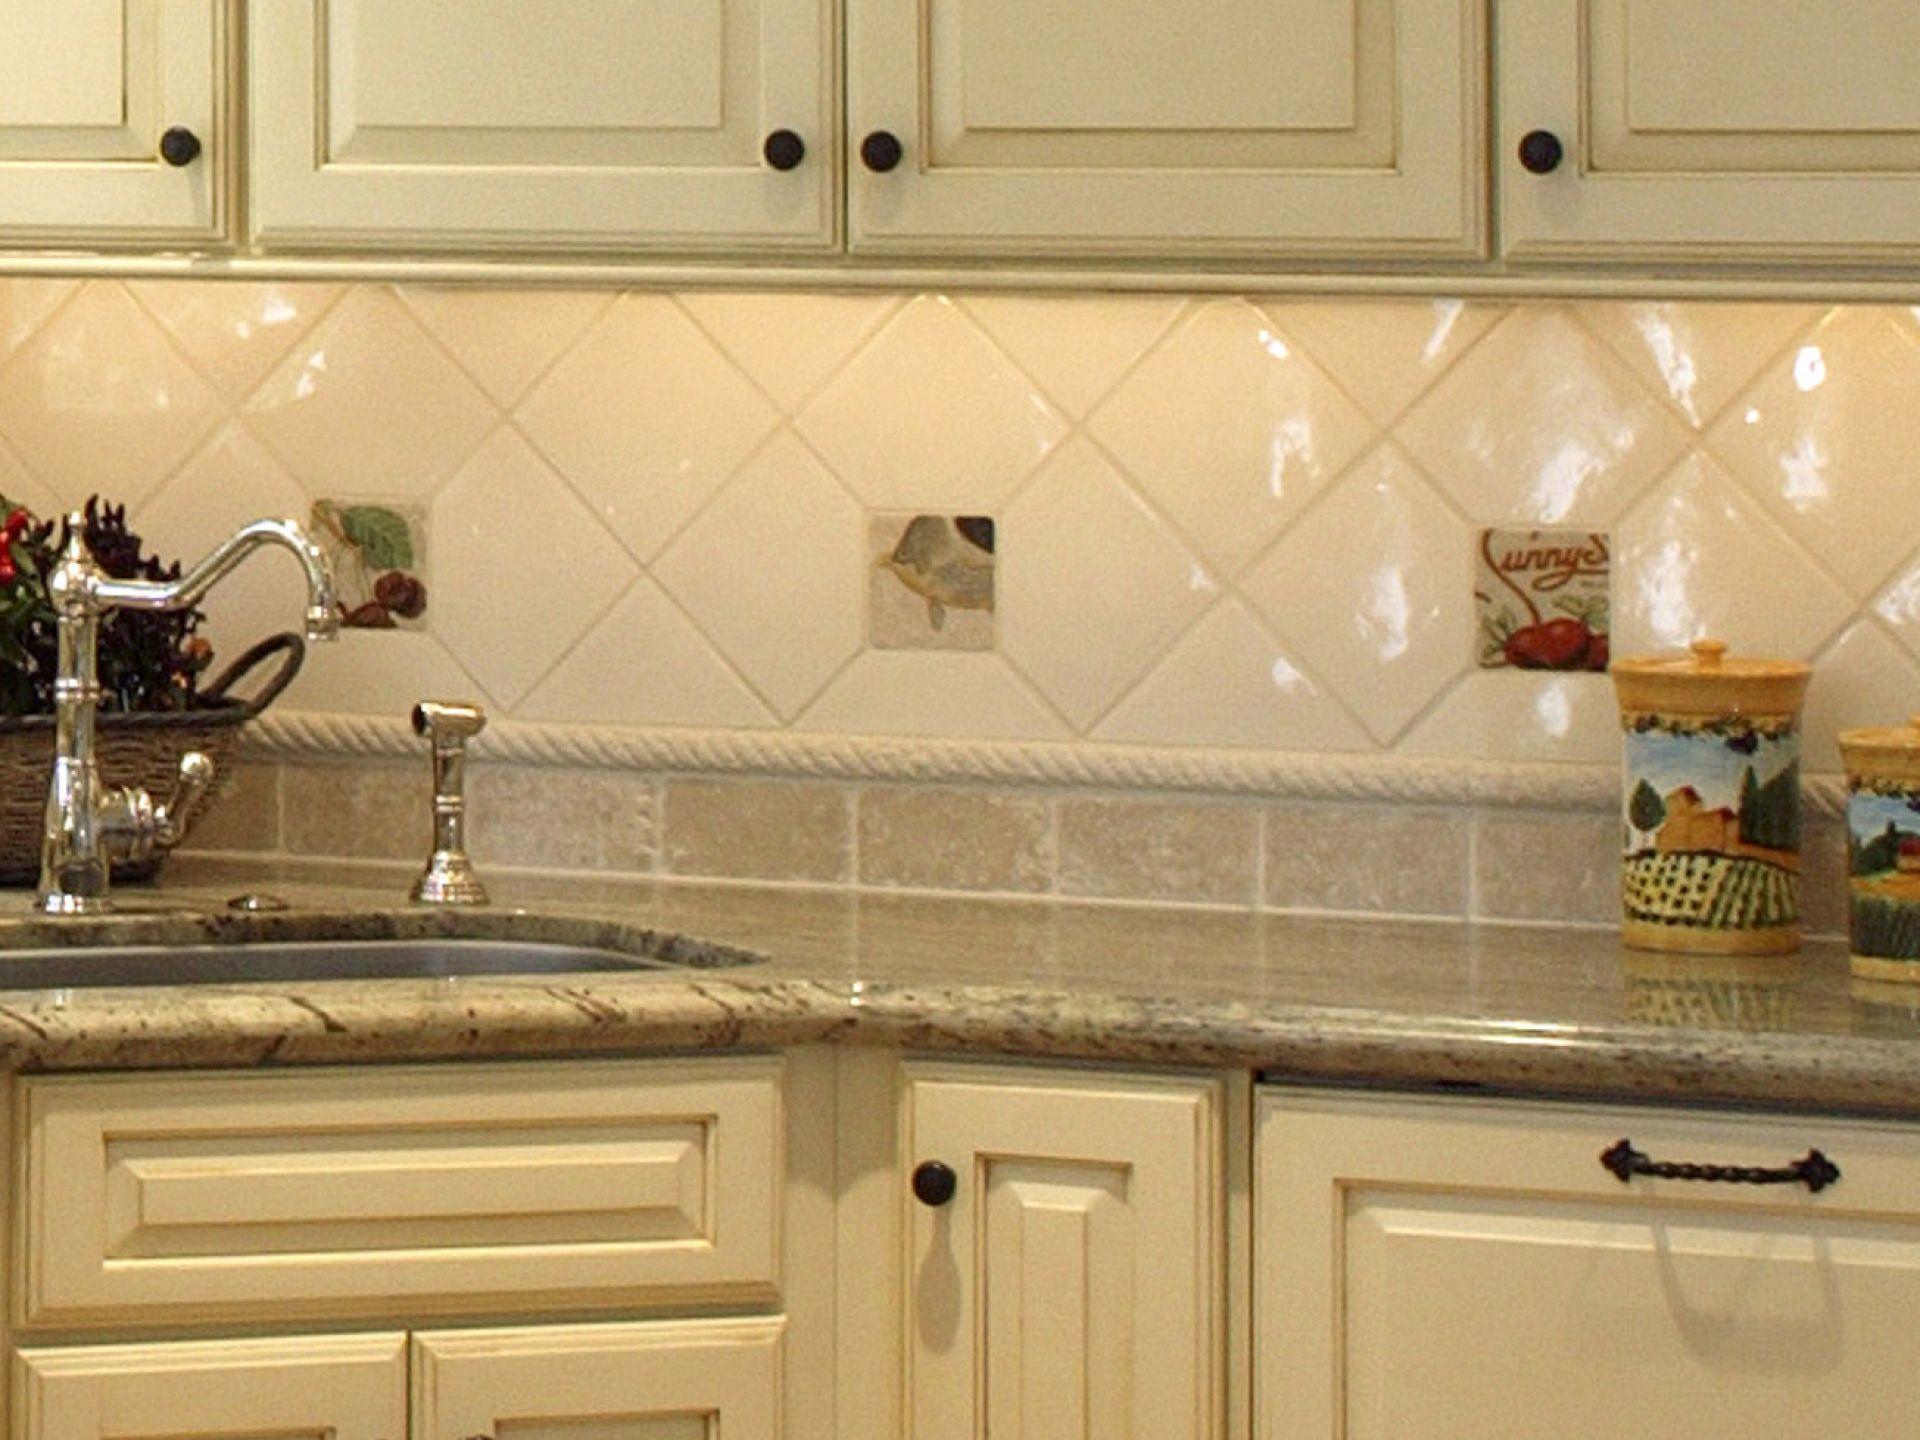 Atemberaubend Küche Design Ideen Fliese Aufkantung Fotos ...